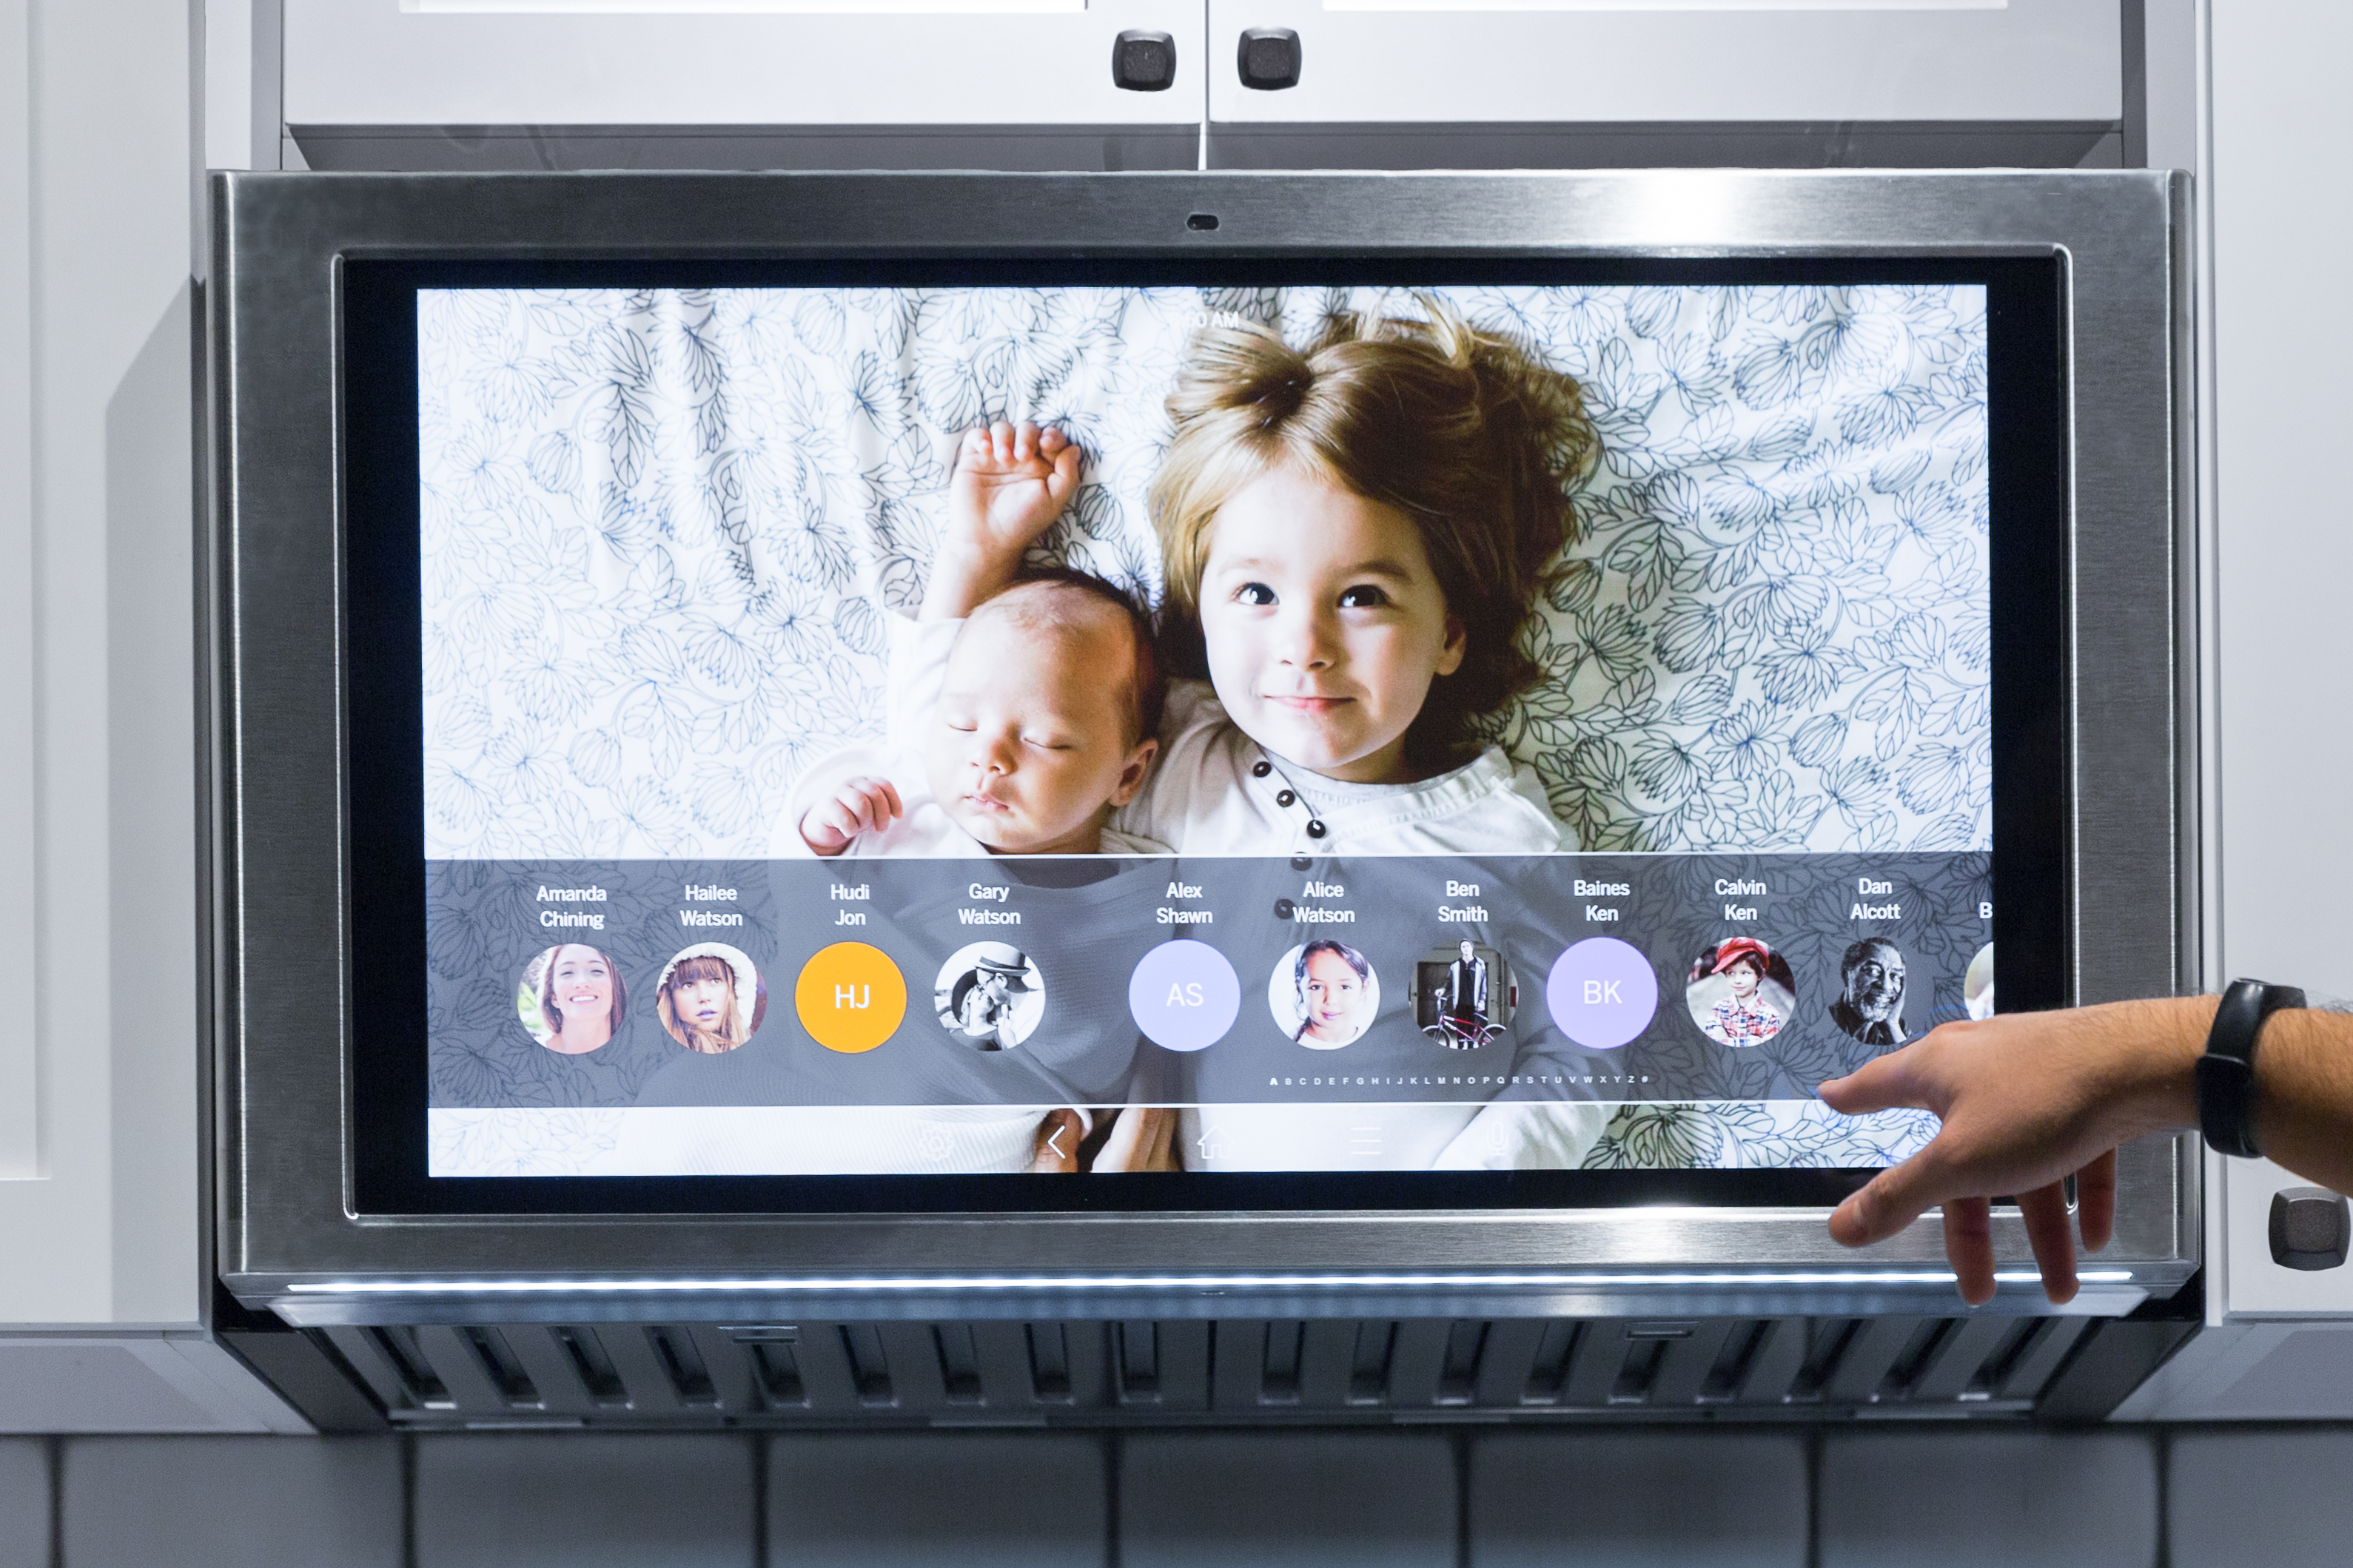 جی ای اپلاینس خانه هوشمند تبلت آشپزخانه Family Hub GE Appliance